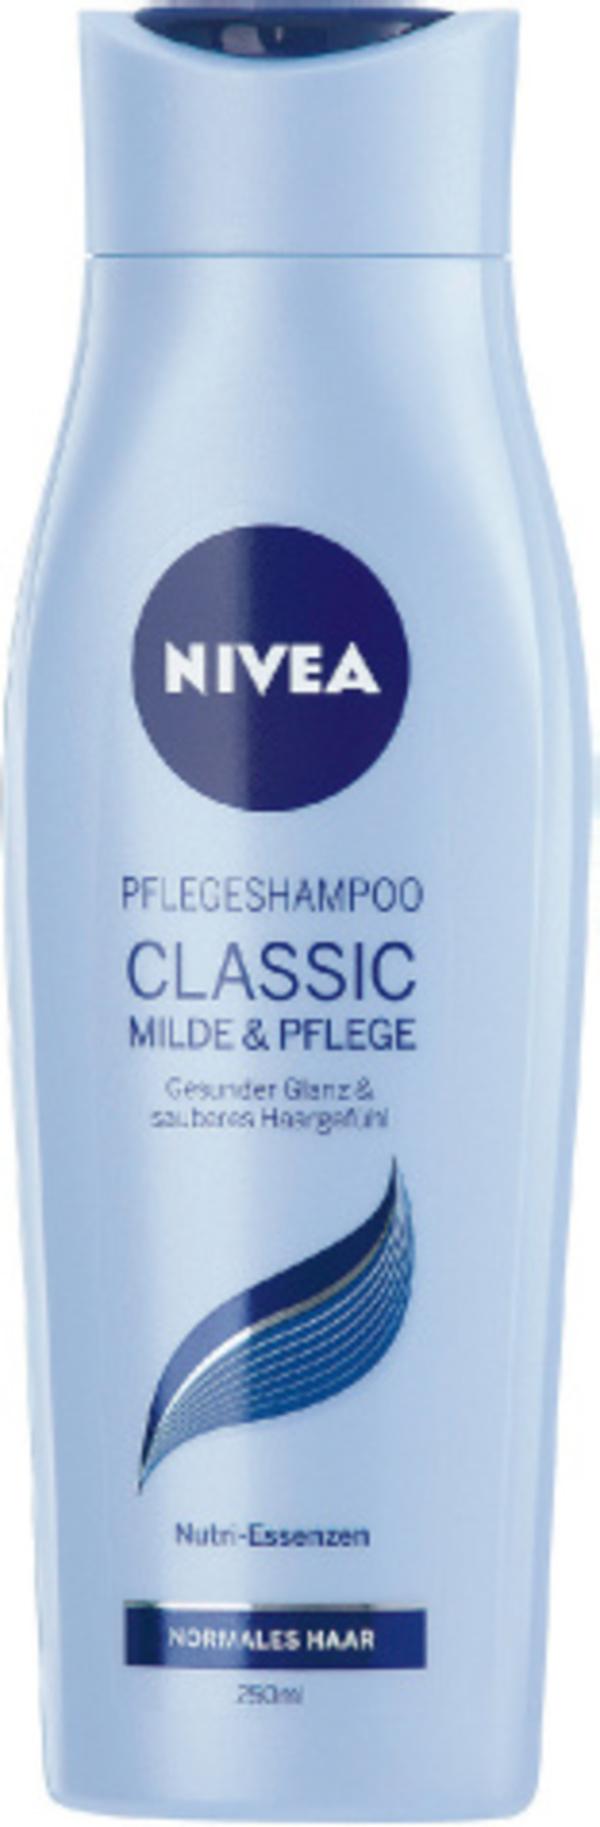 Nivea  Shampoo/Spülung